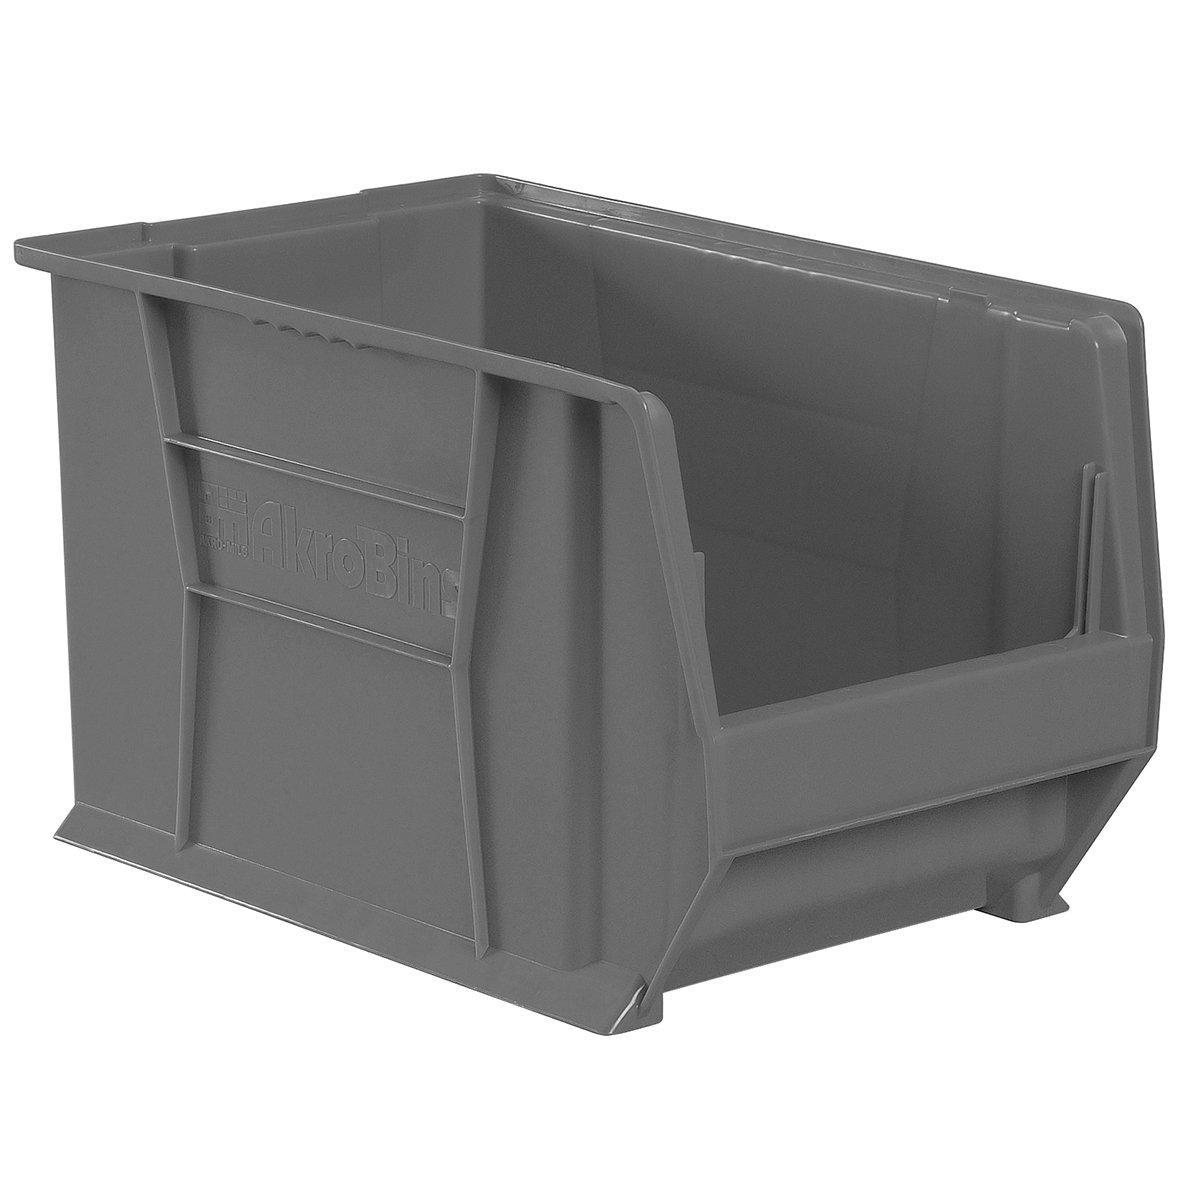 Akro-Mils 30282GREY Super Size Plastic Stacking Storage, 20-Inch x 12-Inch x 12-Inch, Grey, Case of 2